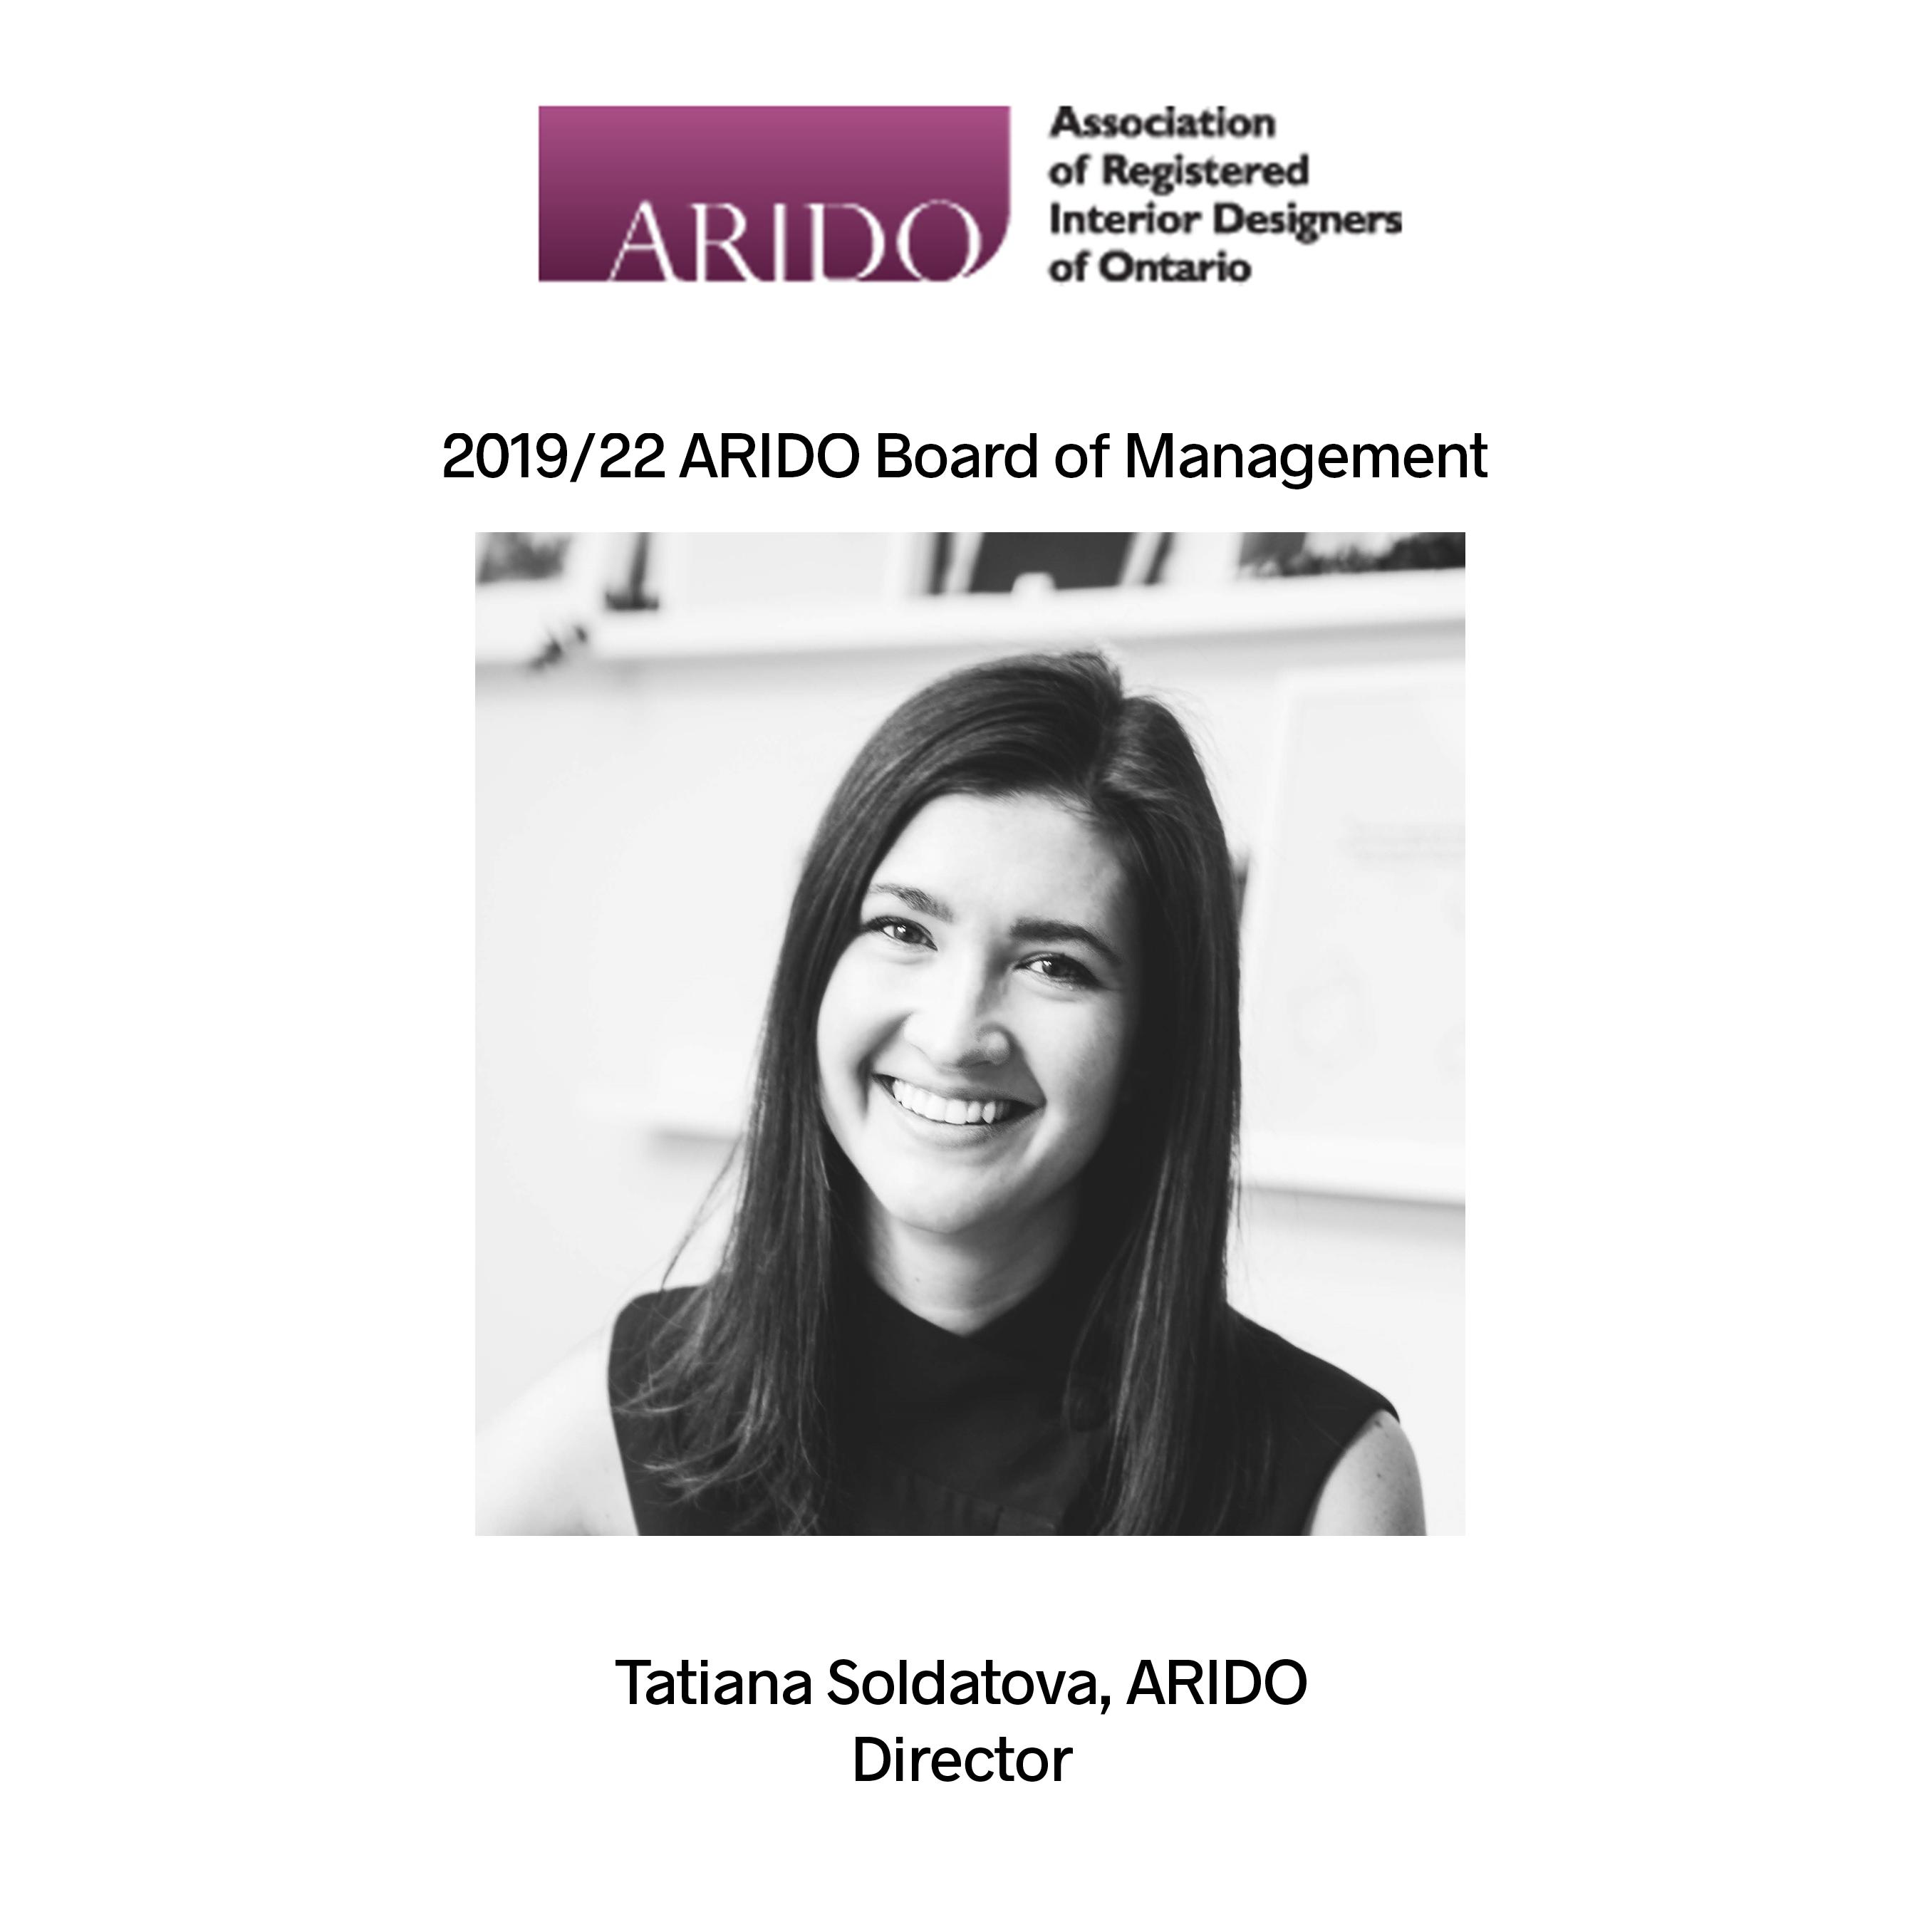 Tatiana Soldatova Appointed ARIDO Board of Directors 2019-2022